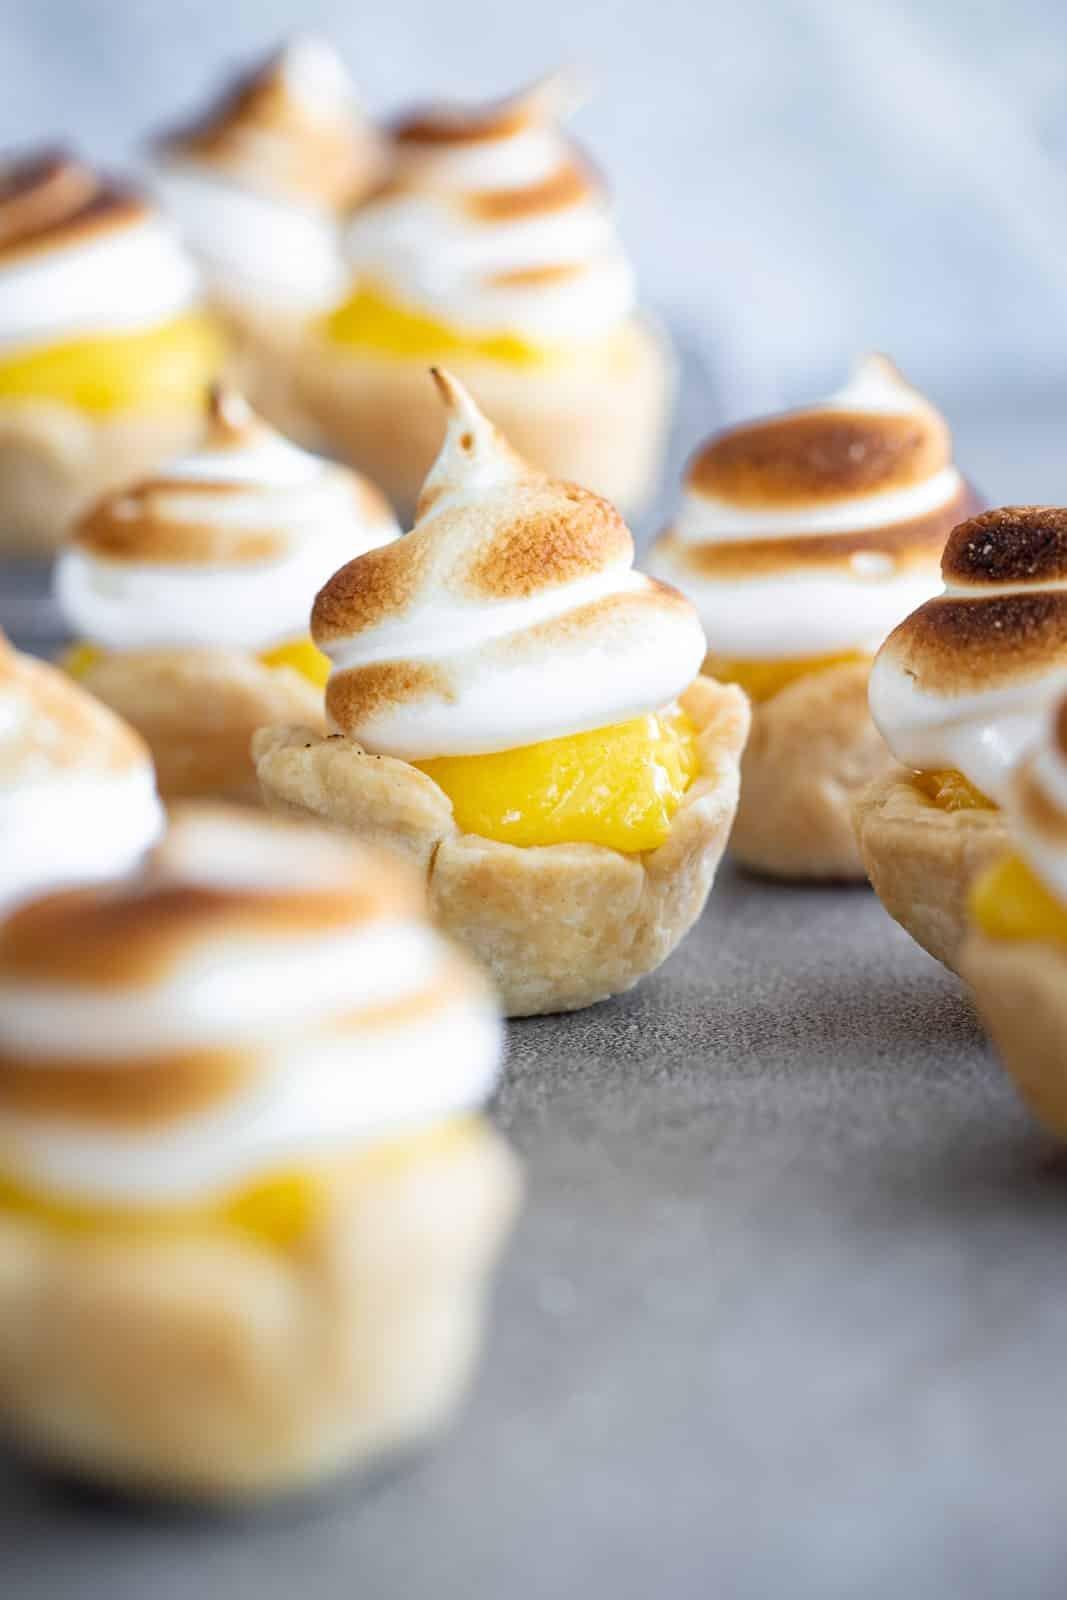 Mini Lemon Meringue Pies on set together on a surface.